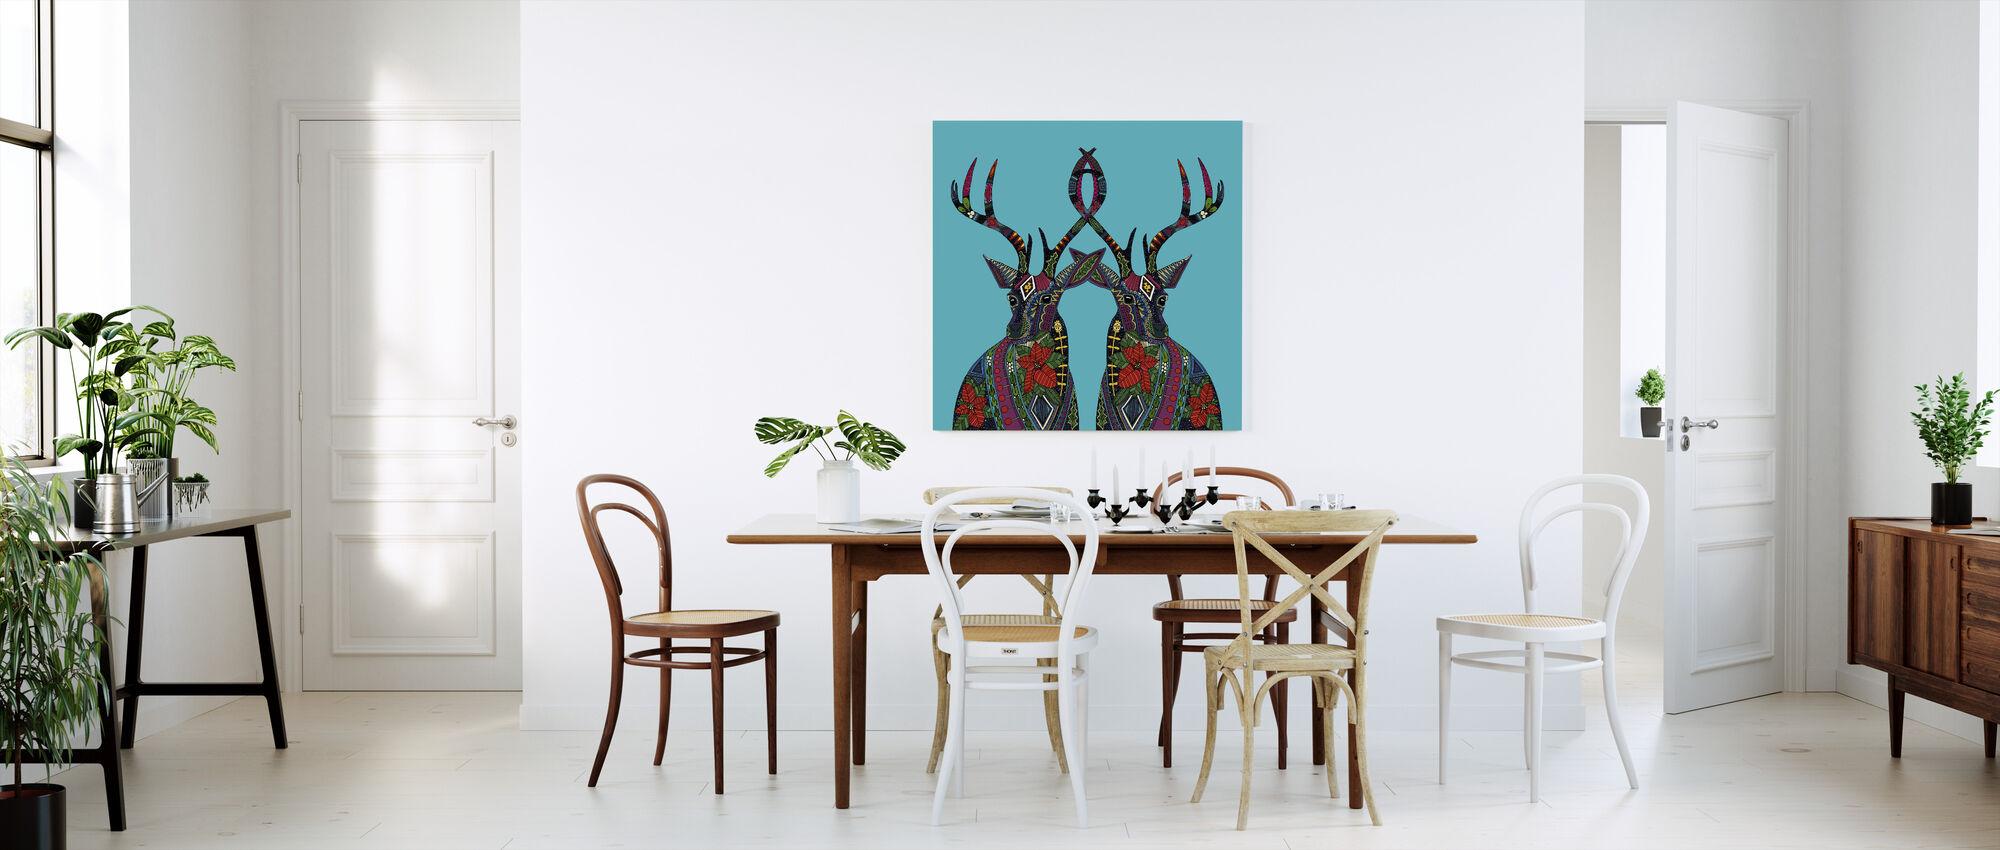 Poinsettia Deer - Canvas print - Kitchen